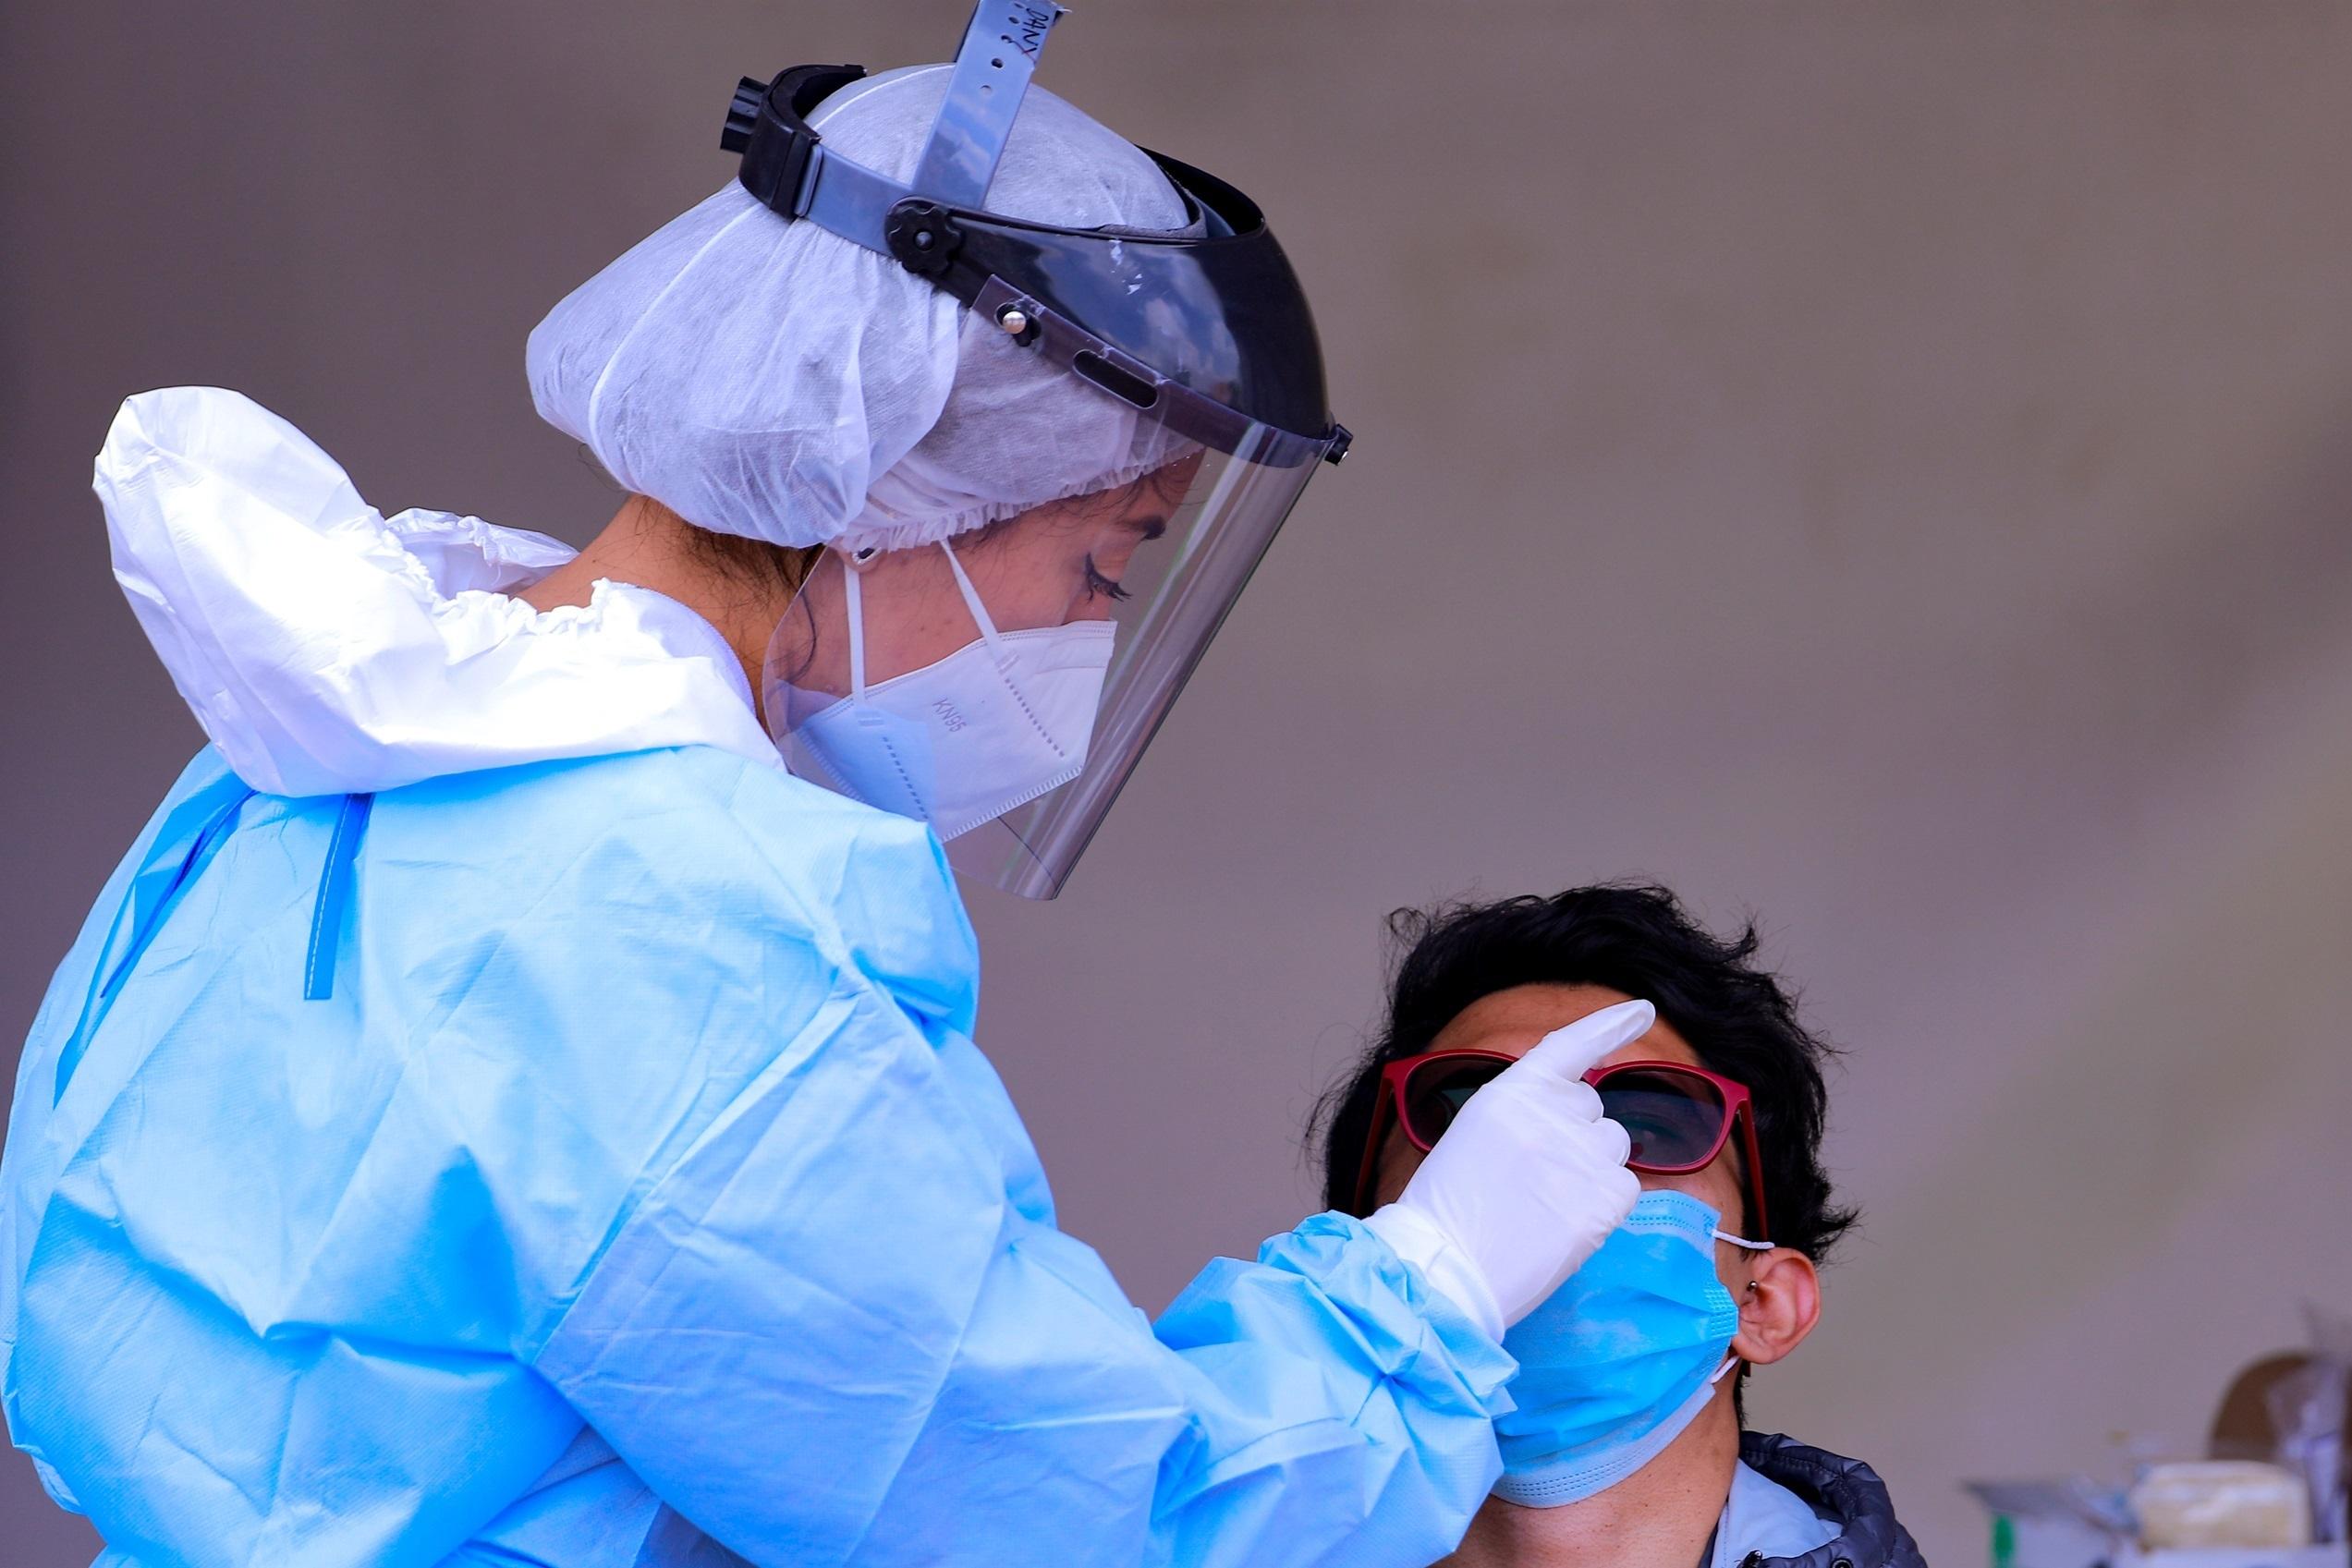 Una sanitaria realiza una prueba de coronavirus.